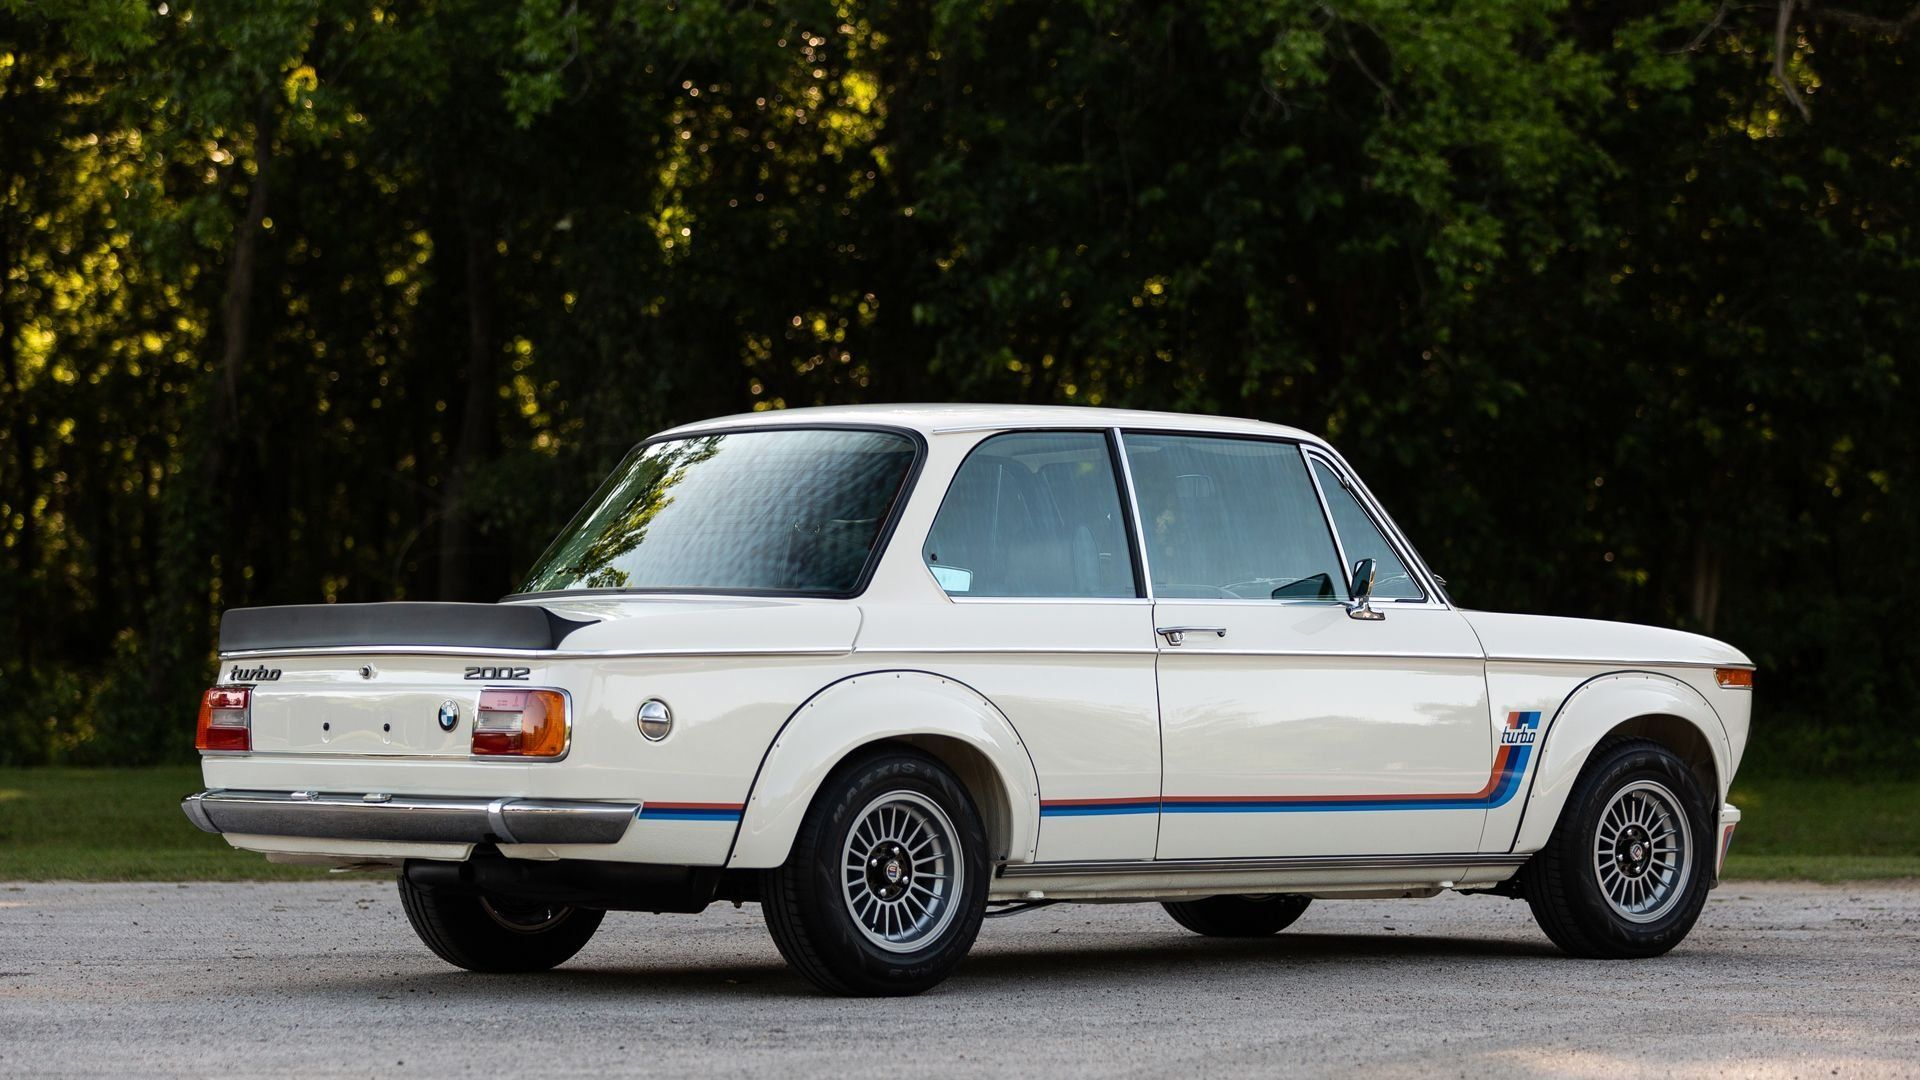 Legendary 1974 BMW 2002 Turbo Seeks New Driver